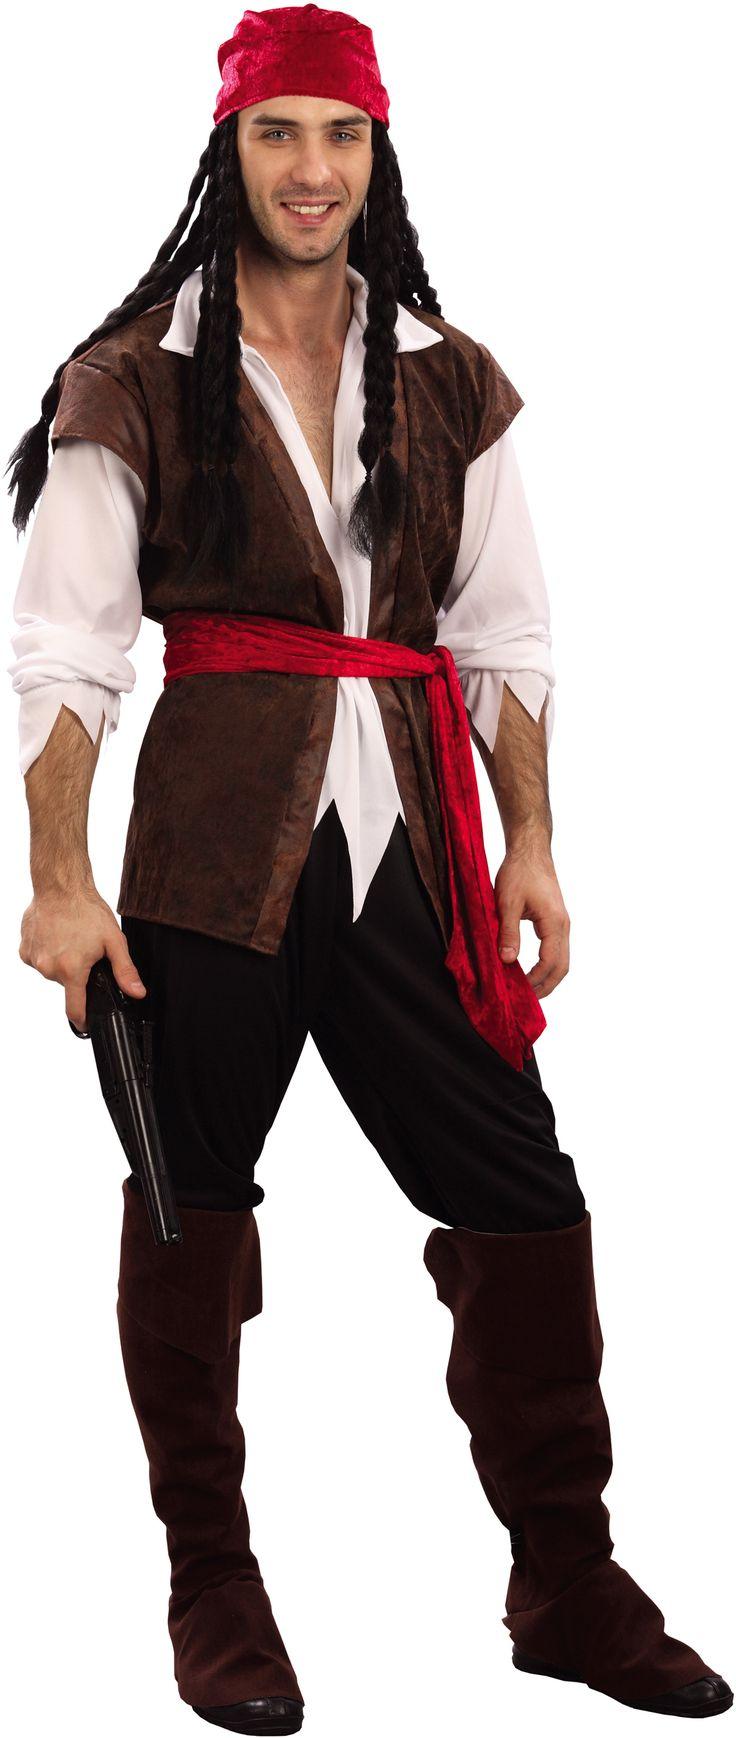 Déguisement pirate homme : Deguise-toi